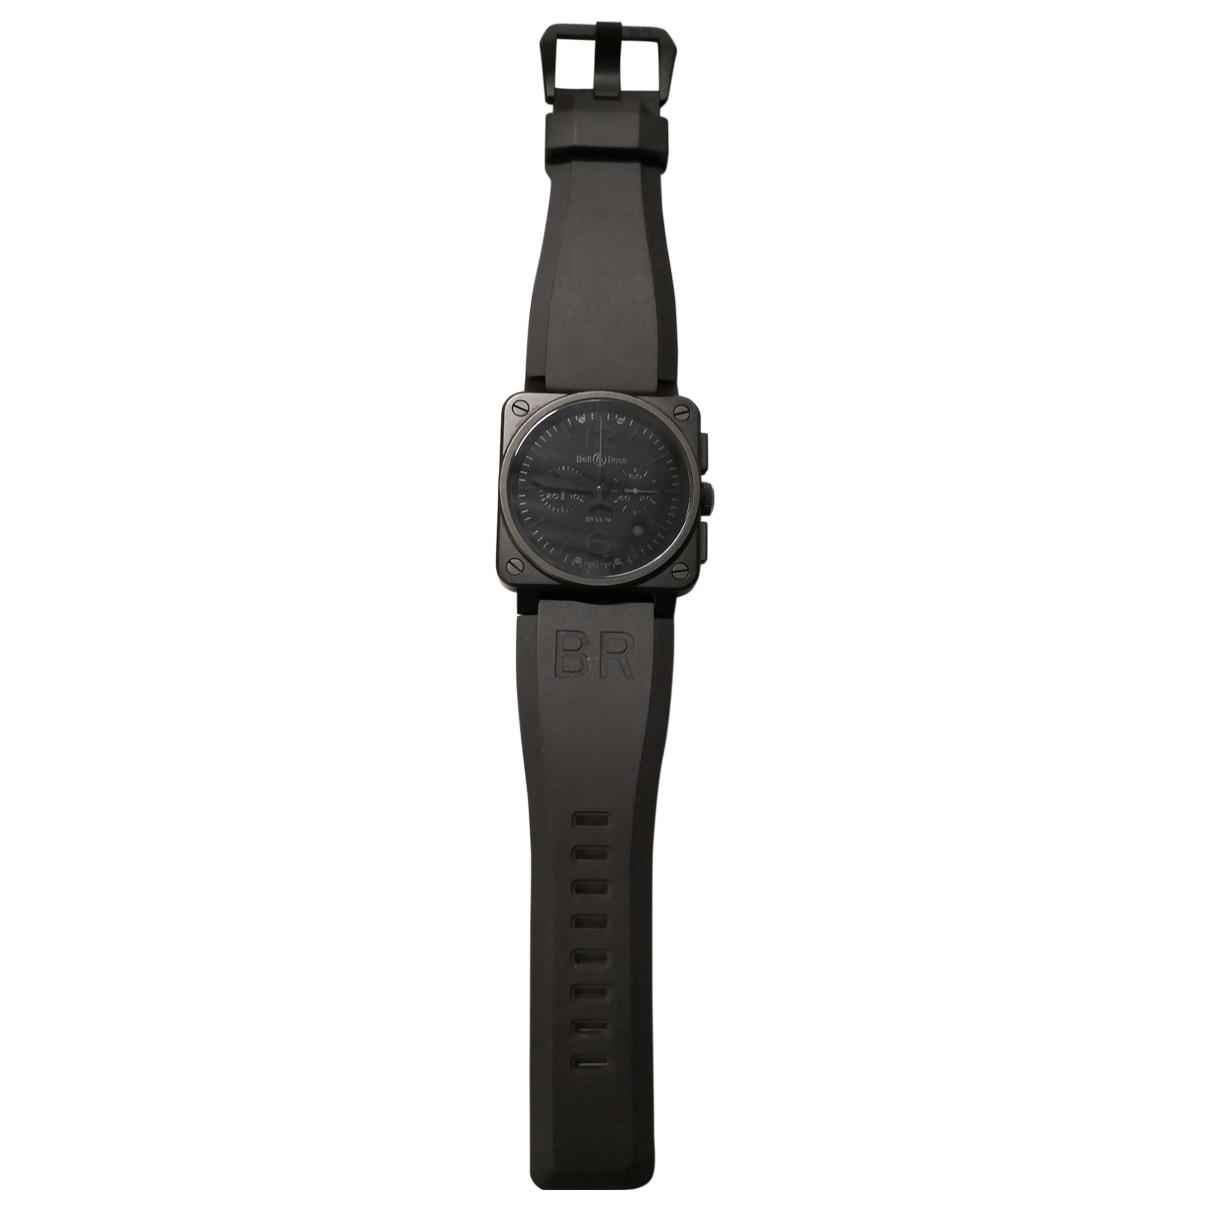 Relojes BR03-94 Bell & Ross